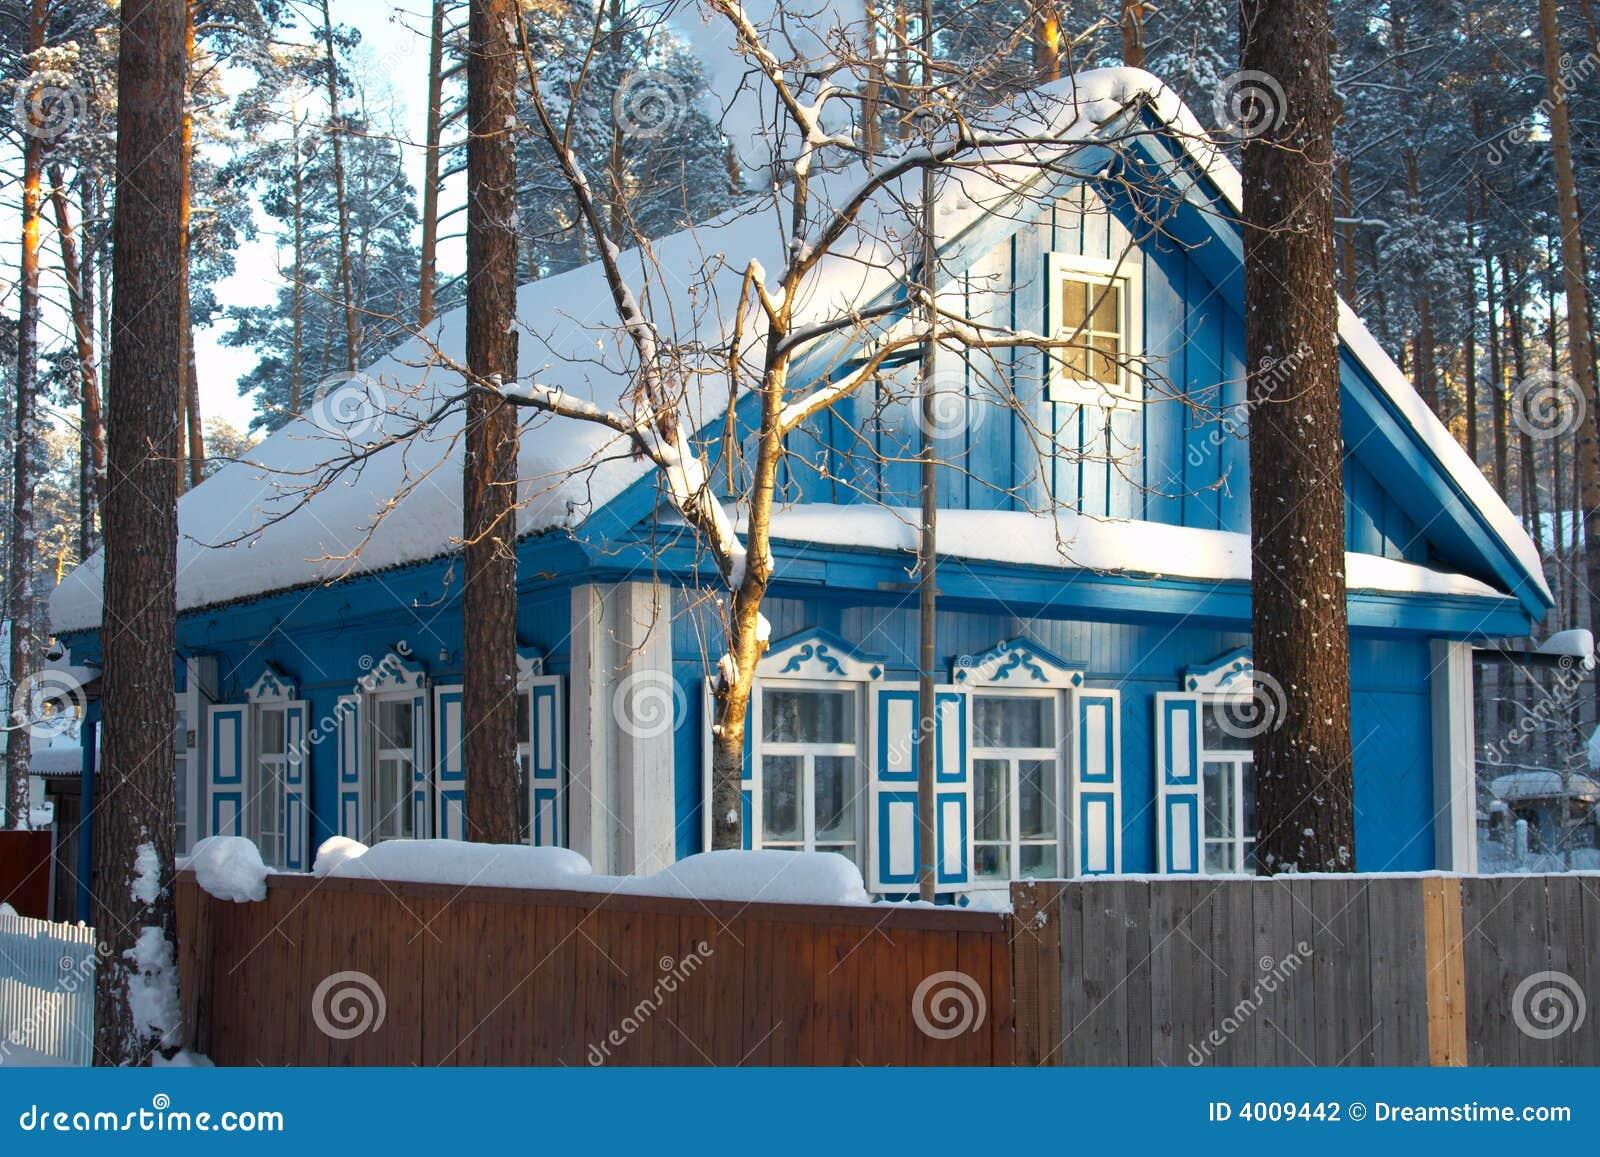 russisches dorf sibirien kalter winter stockfoto bild. Black Bedroom Furniture Sets. Home Design Ideas